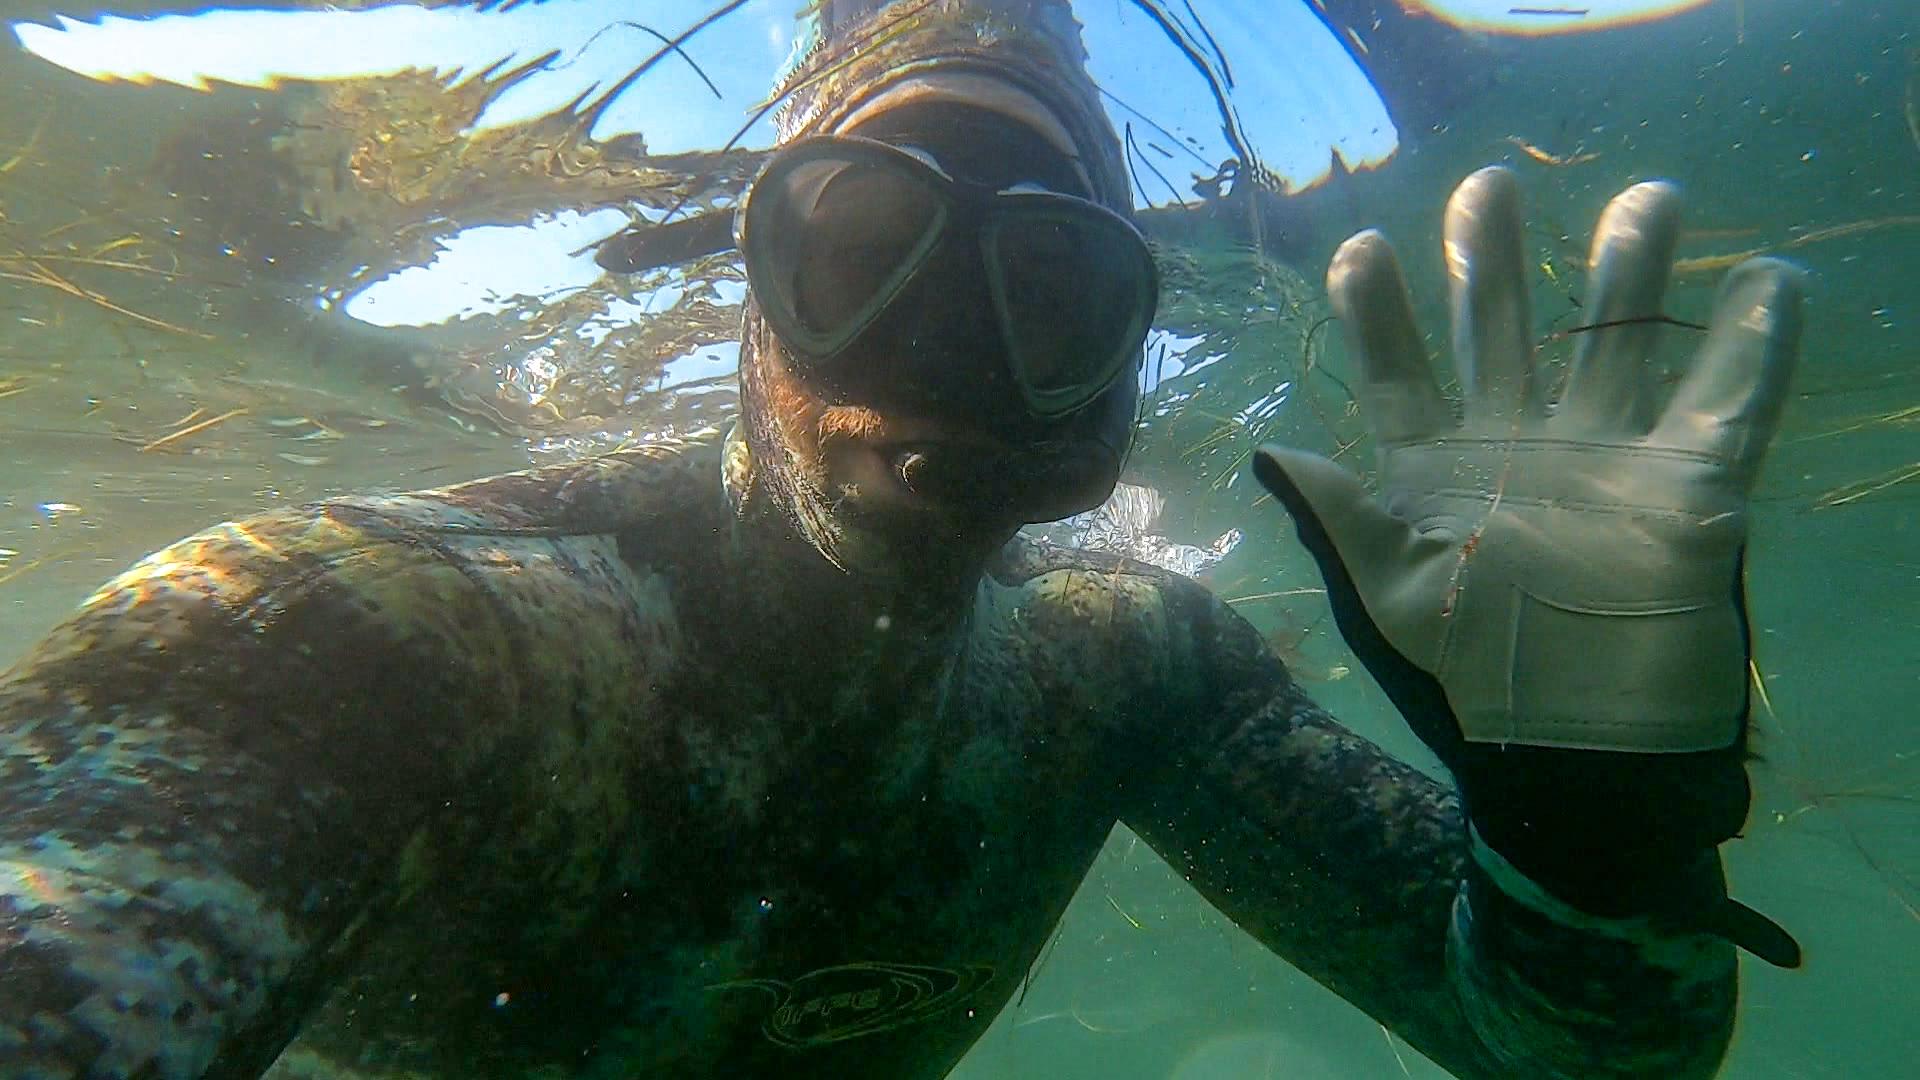 snorkeler waving at camera underwater